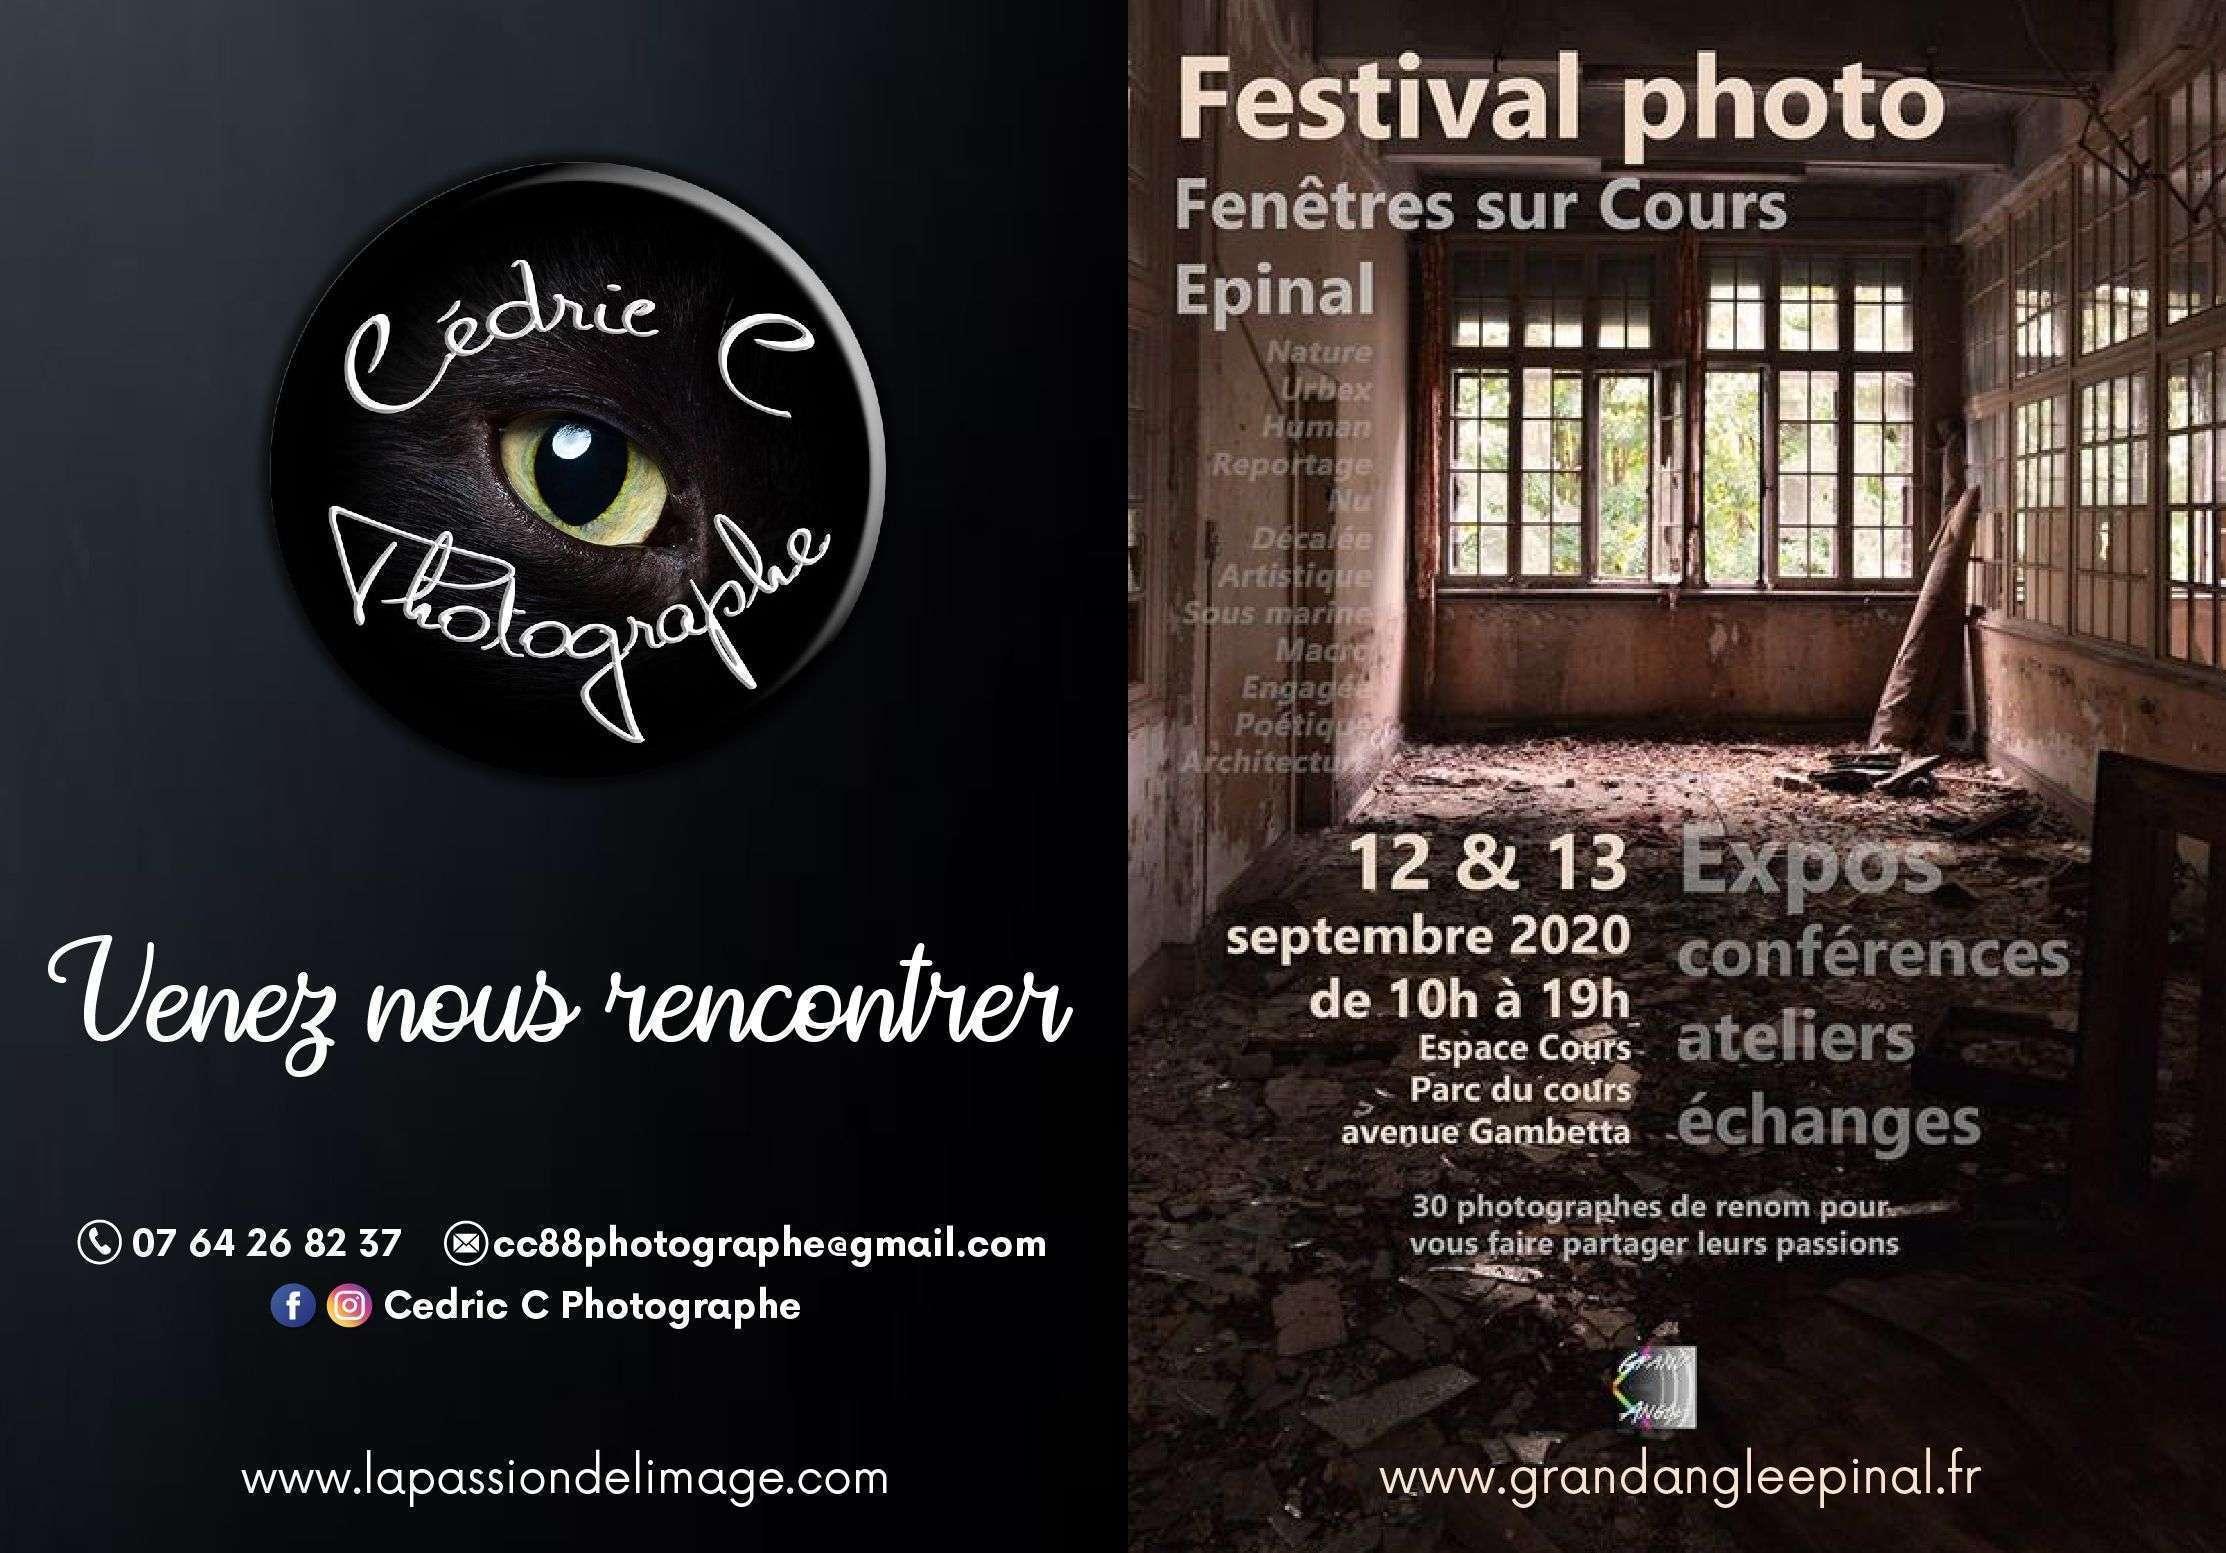 Festival photo